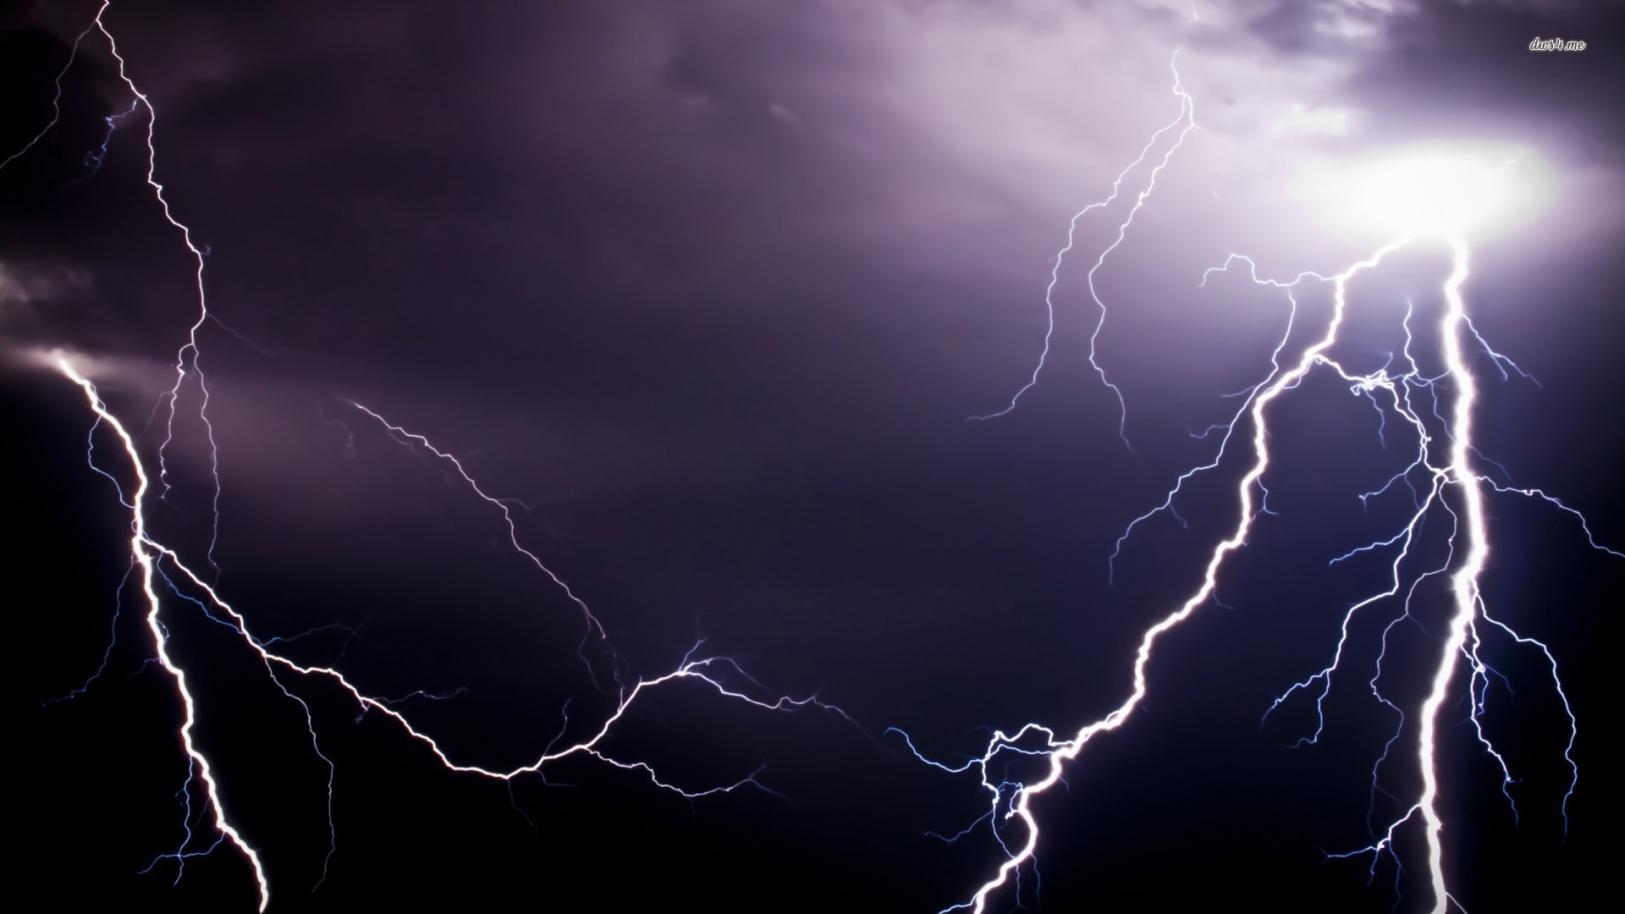 Related Keywords & Suggestions for Black Lightning Background